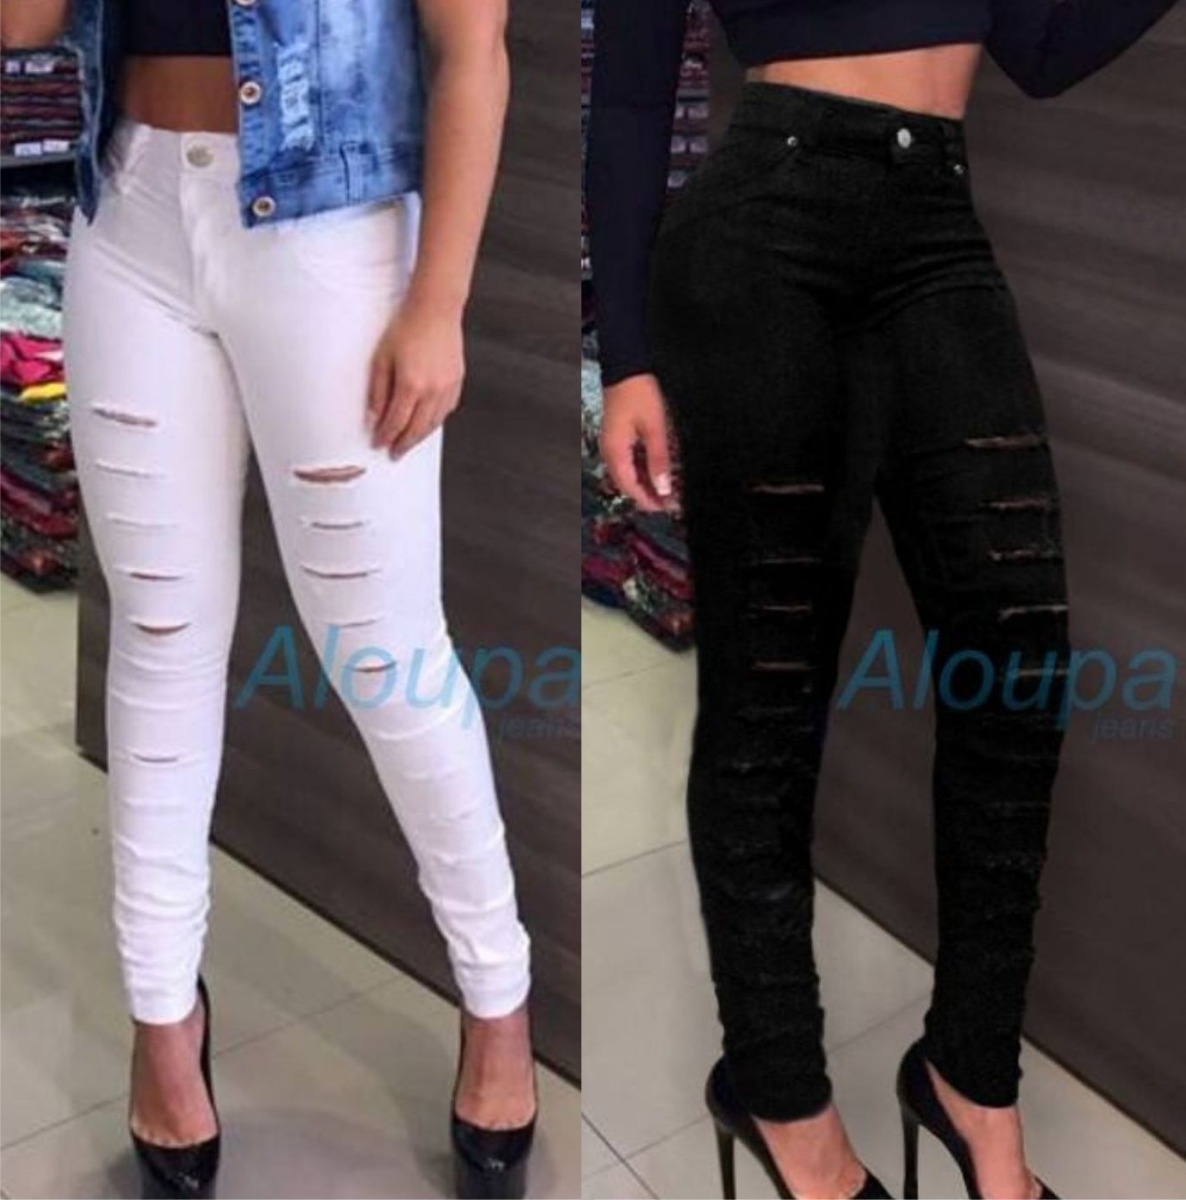 d5836f3c8 kit 2 calças jeans rasgada cintura alta roupas feminina dins. Carregando  zoom.